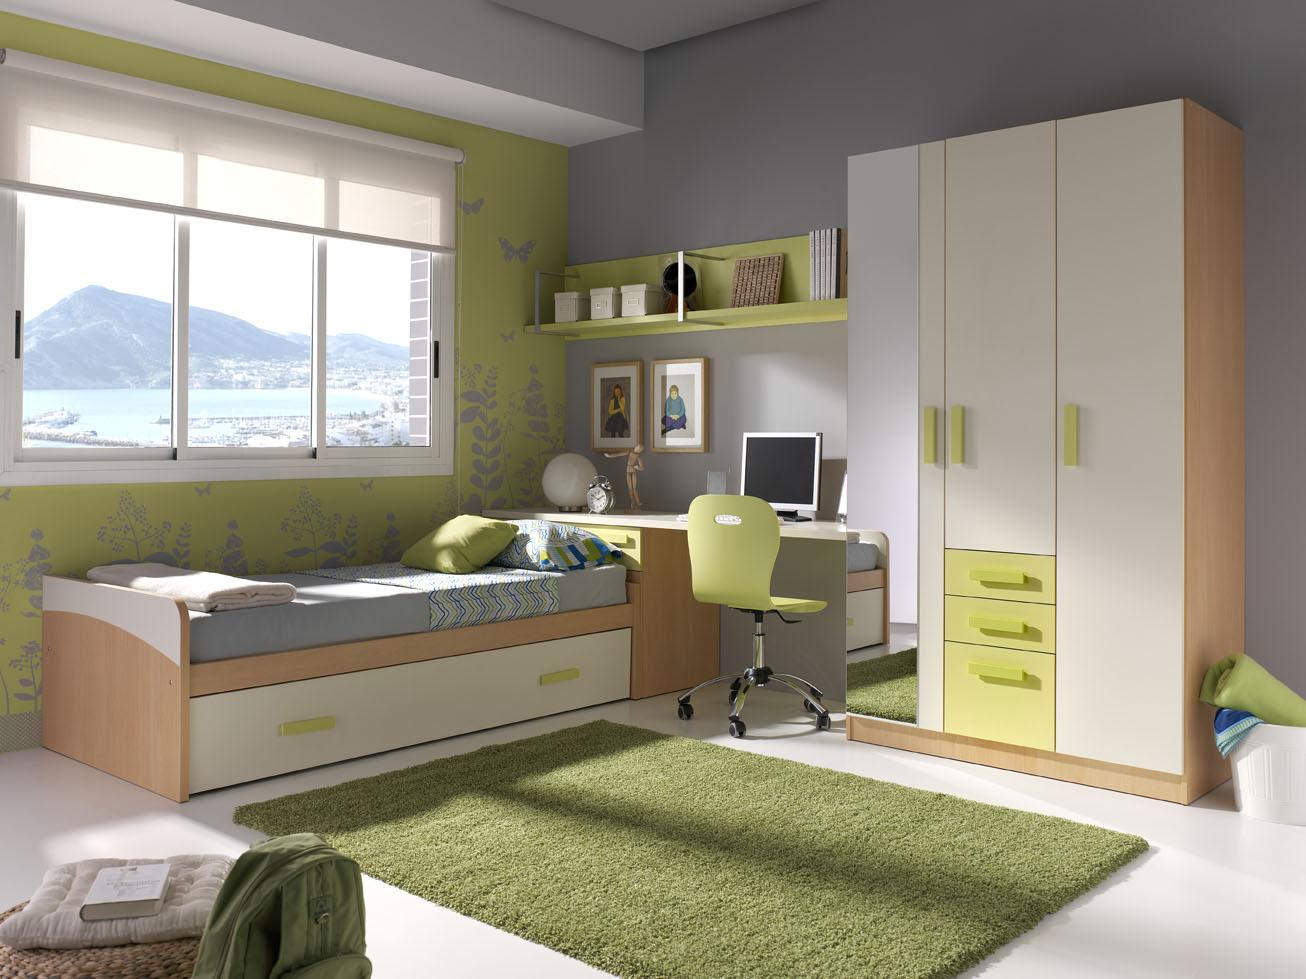 Muebles Para Dormitorios Modernos. Muebles Para Dormitorios Modernos ...